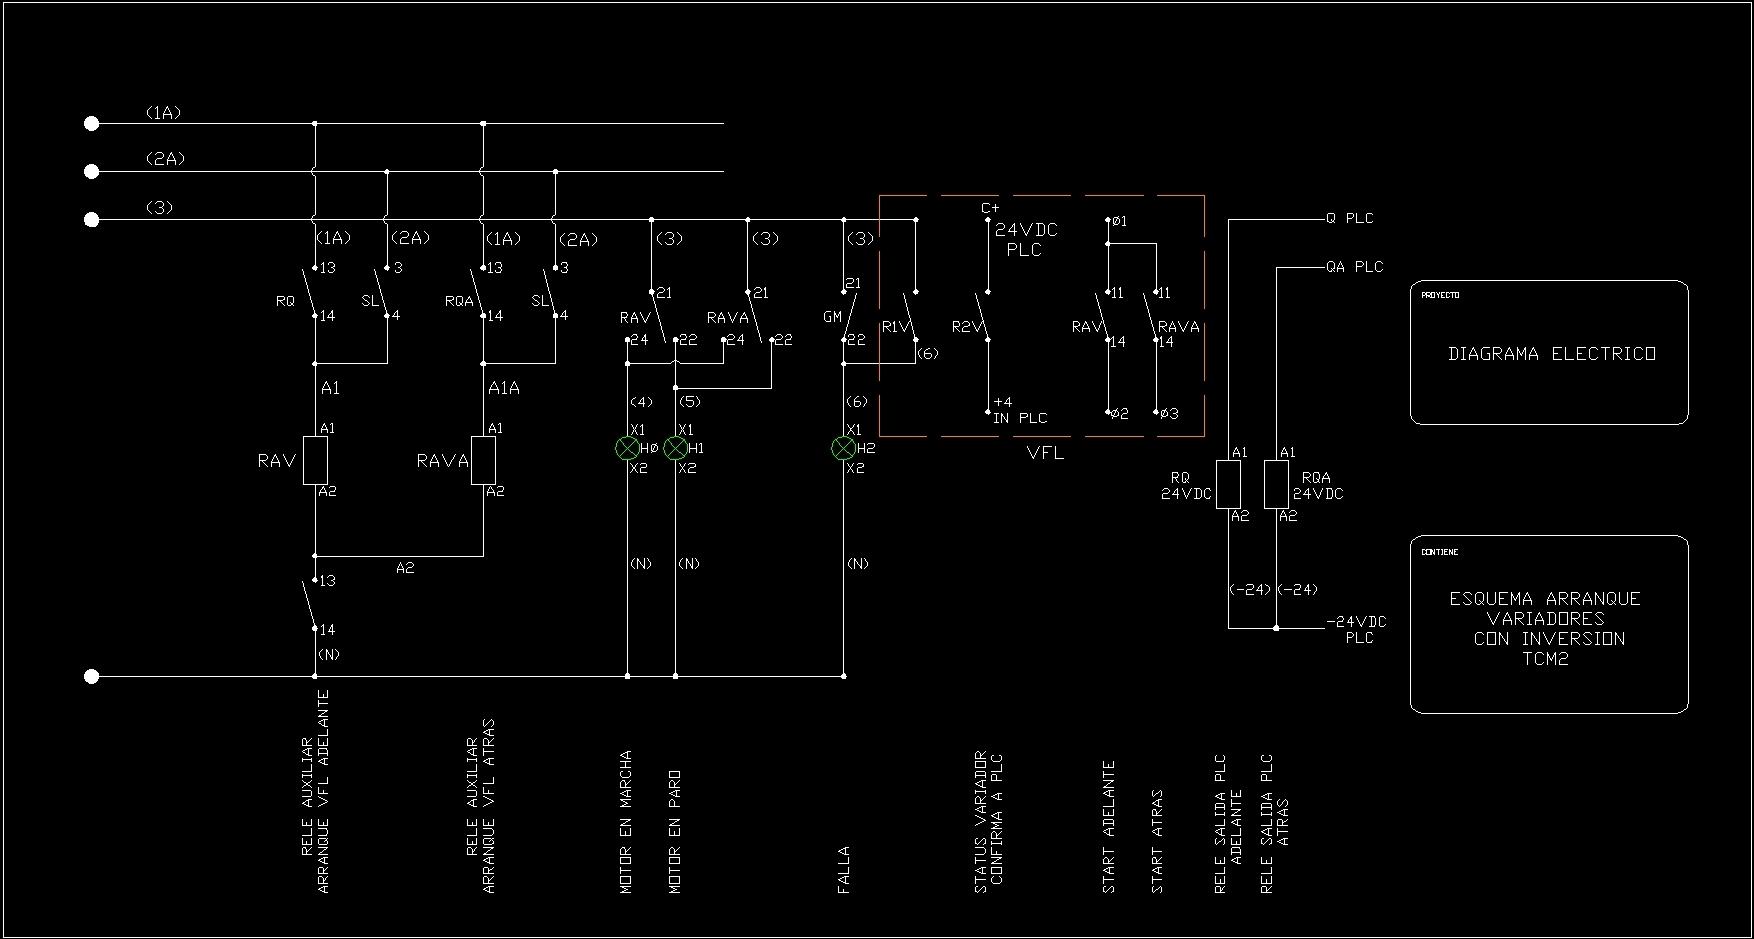 electric car diagram directv swm 5 lnb dish wiring diagramas elÉctricos dwg block for autocad • designs cad